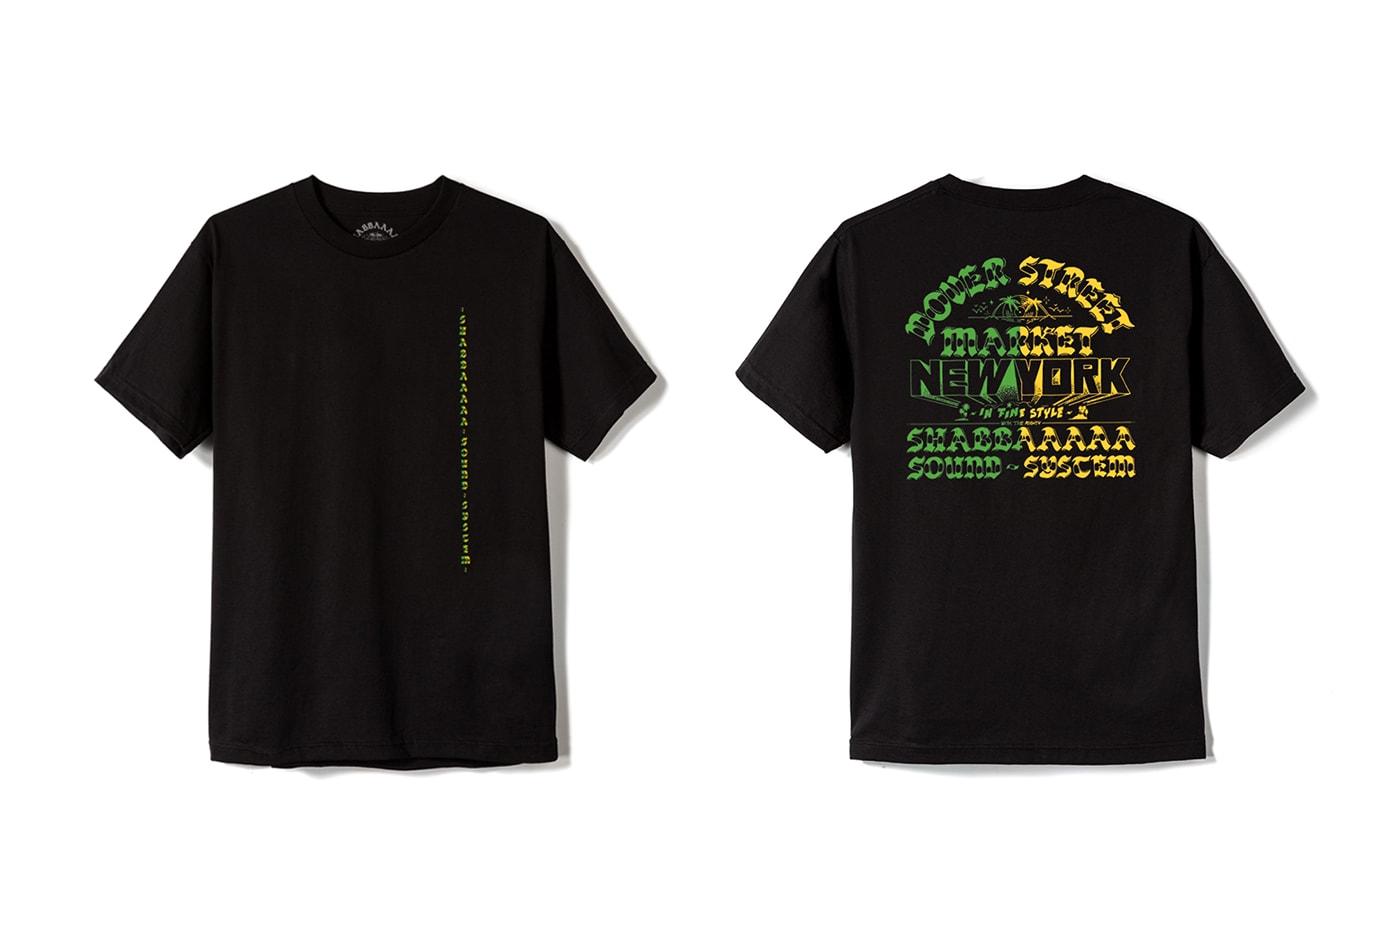 meilleures baskets 58c58 45b93 SHABBAAAAA & DSMNY Collaborative T-Shirt Design | HYPEBEAST